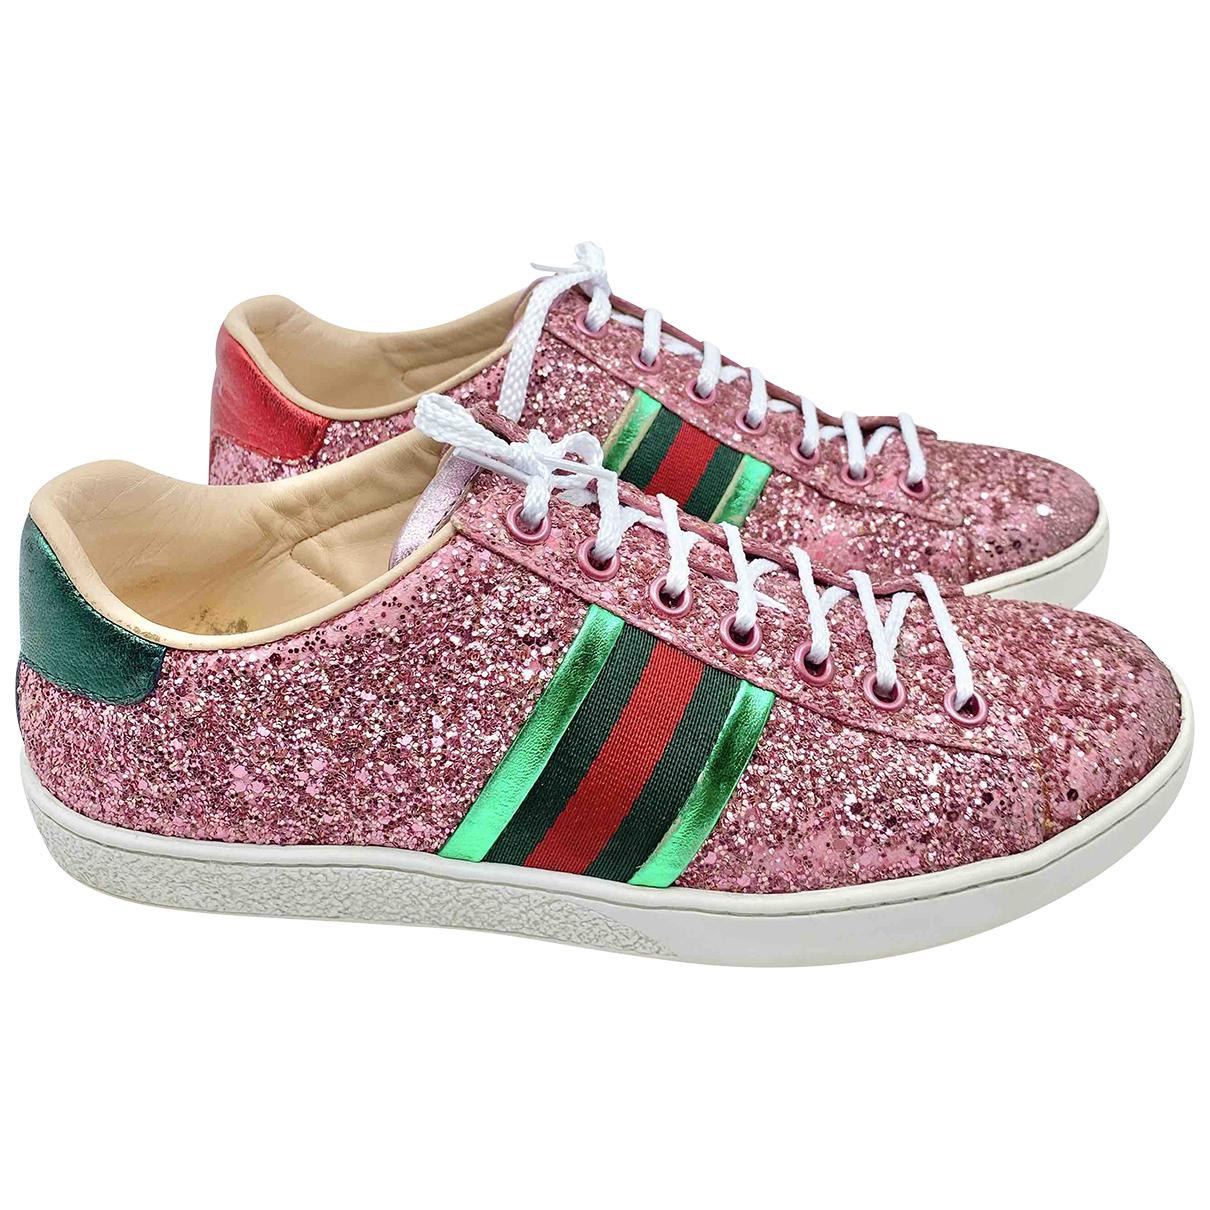 Gucci Ace Pink Glitter Trainers for Women 36 EU